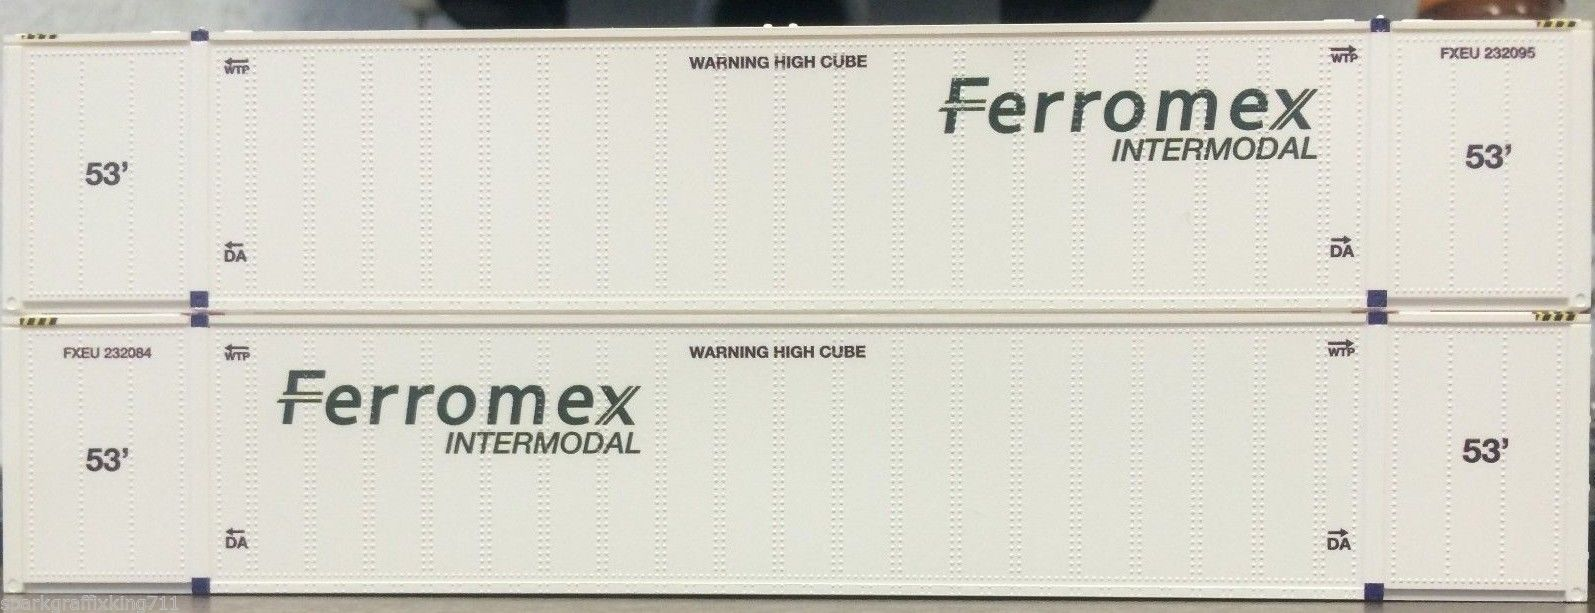 HO HI-CUBE 53FT CONTAINER FERROMEX INTERMODAL 2PK 0004-088023 (01)